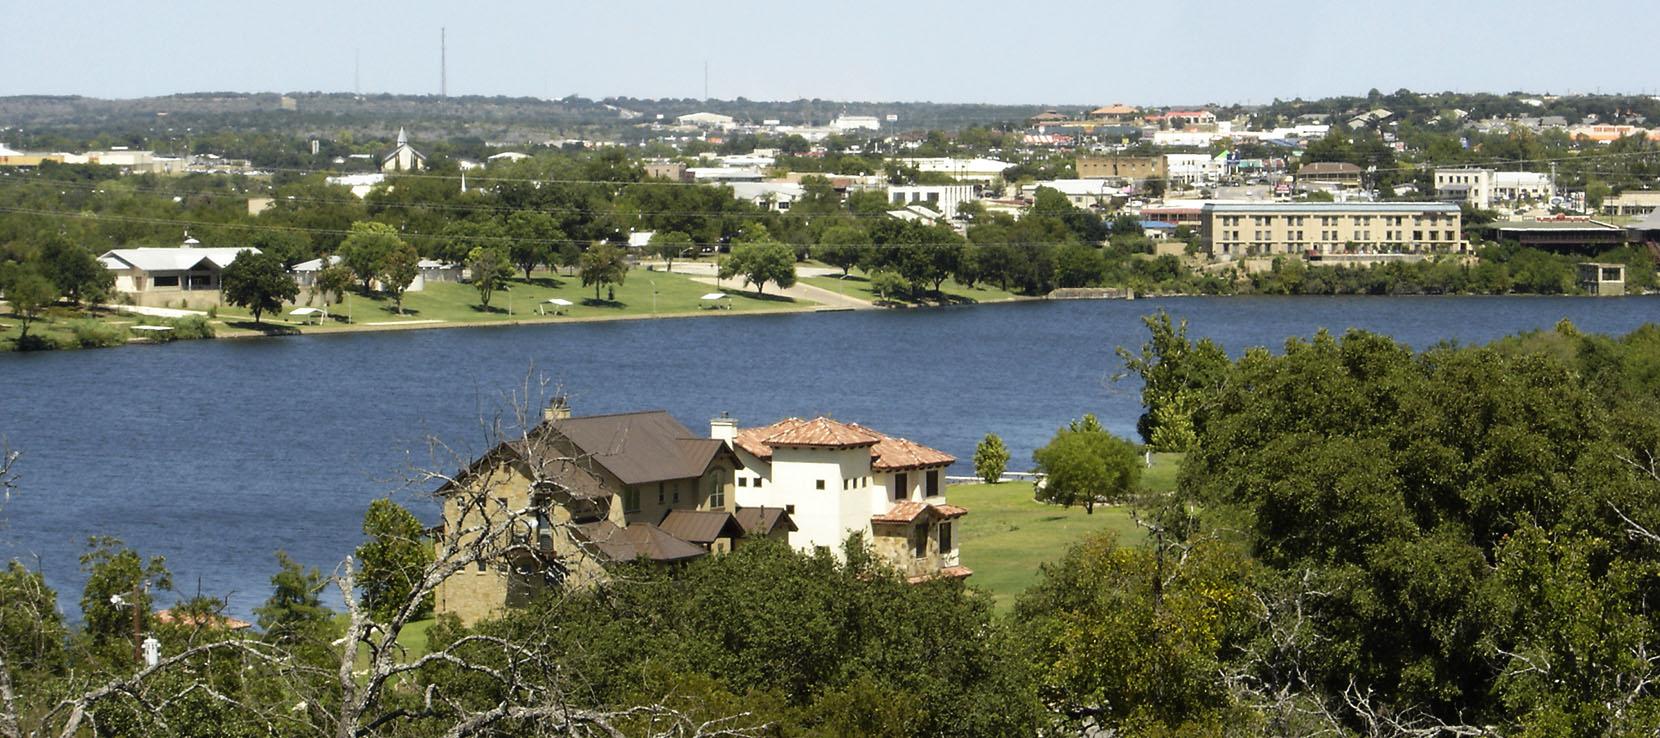 Lone Star RV Park - RV Park In Marble Falls, Texas